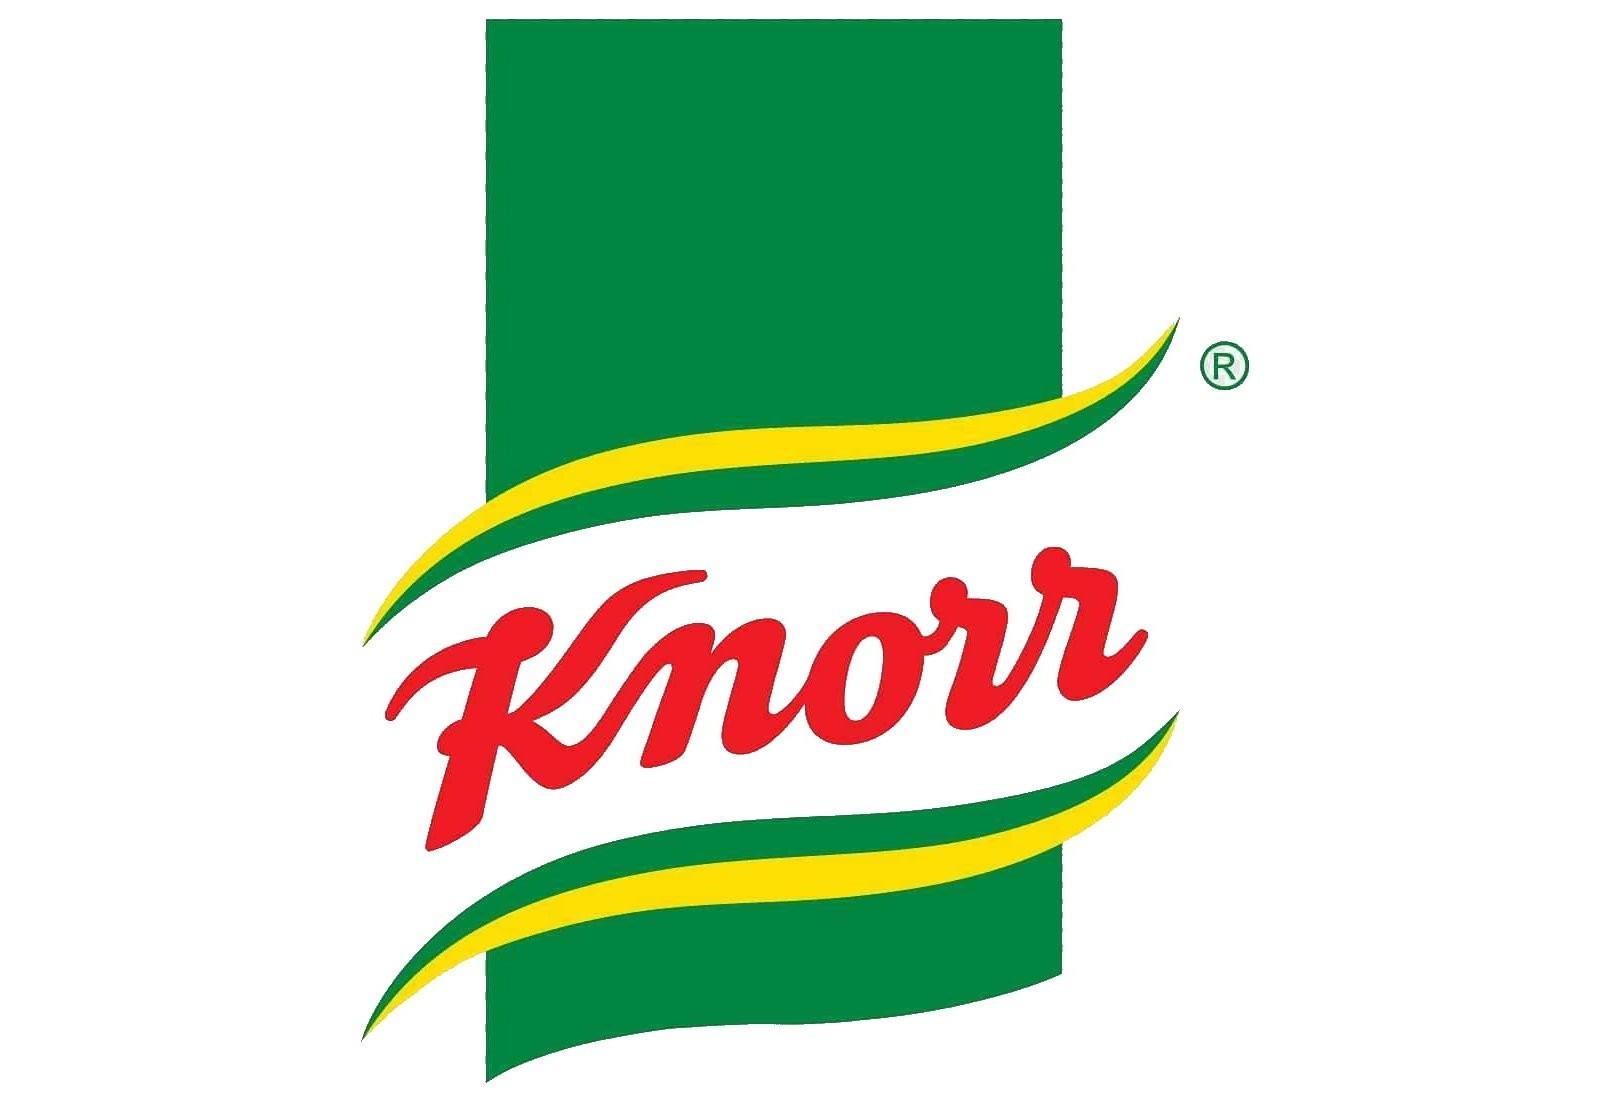 Knorr Pasta, Bouillon & Seasoning Mix, 13,/121 Cases, Ext. Retail $29,245, Edwardsville, IL